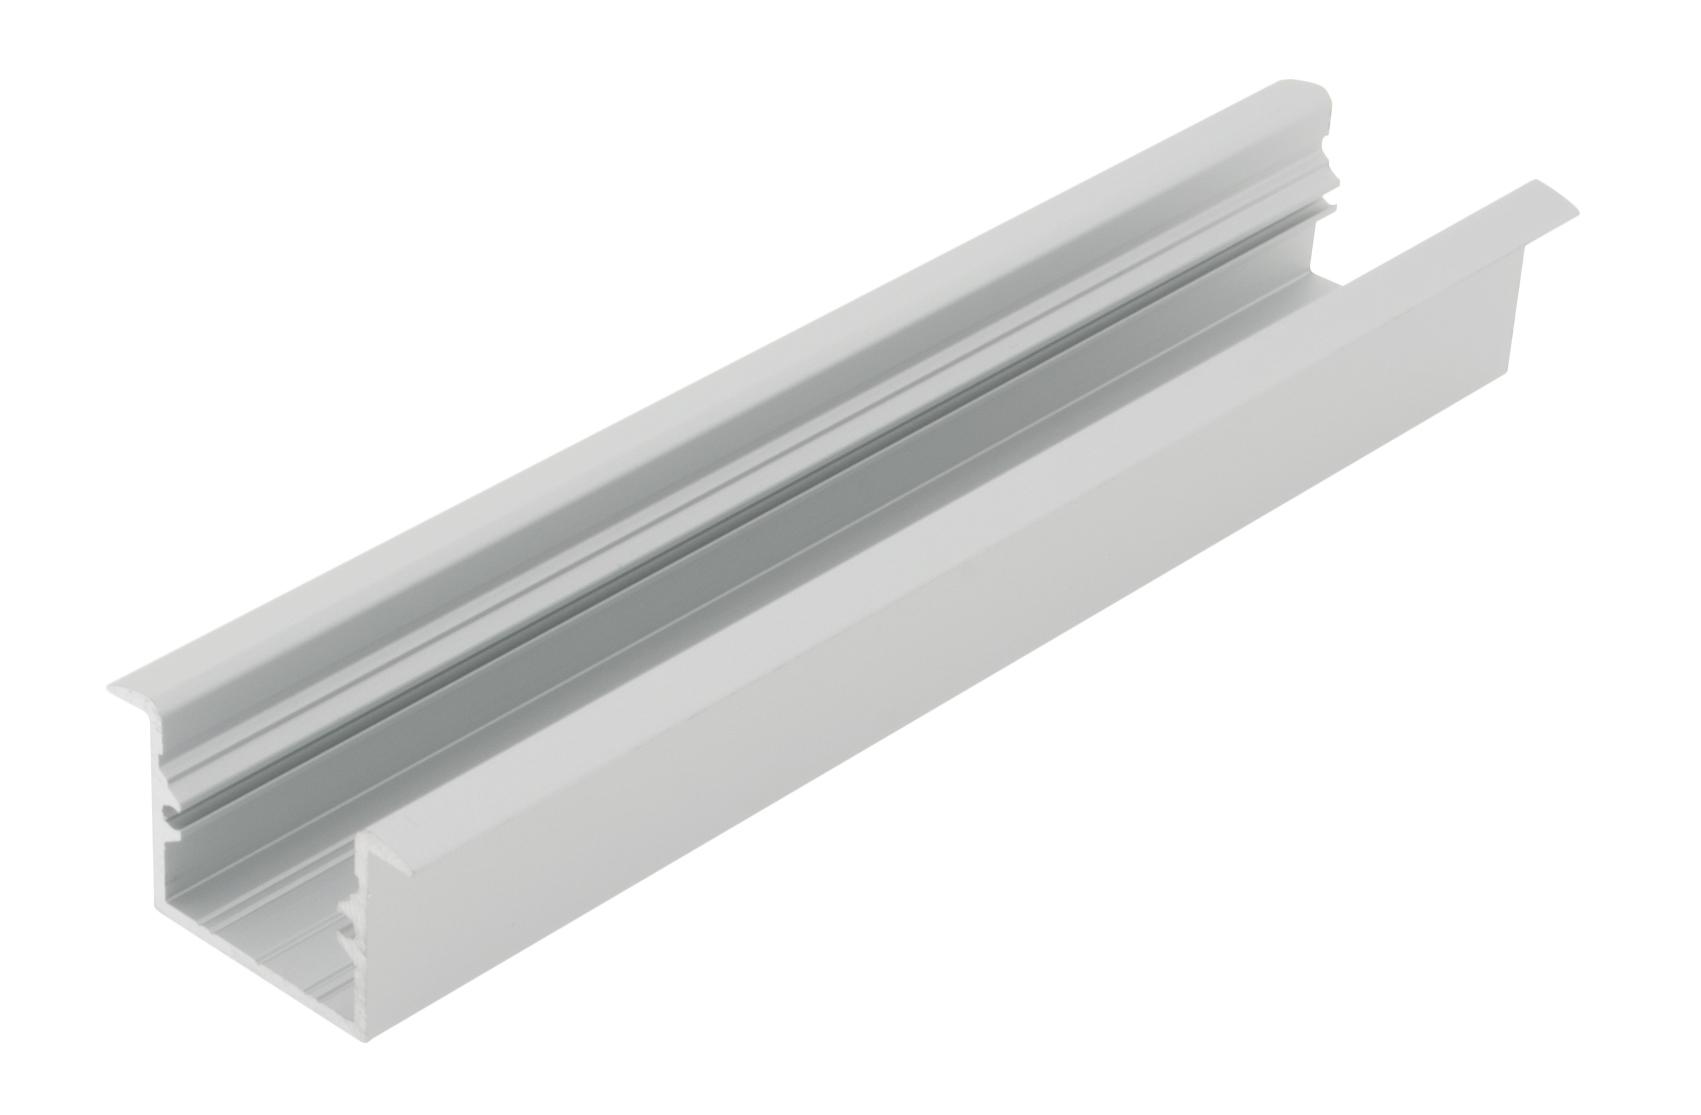 1 m Aluminium Profil TBJ, 2m LIAP002009